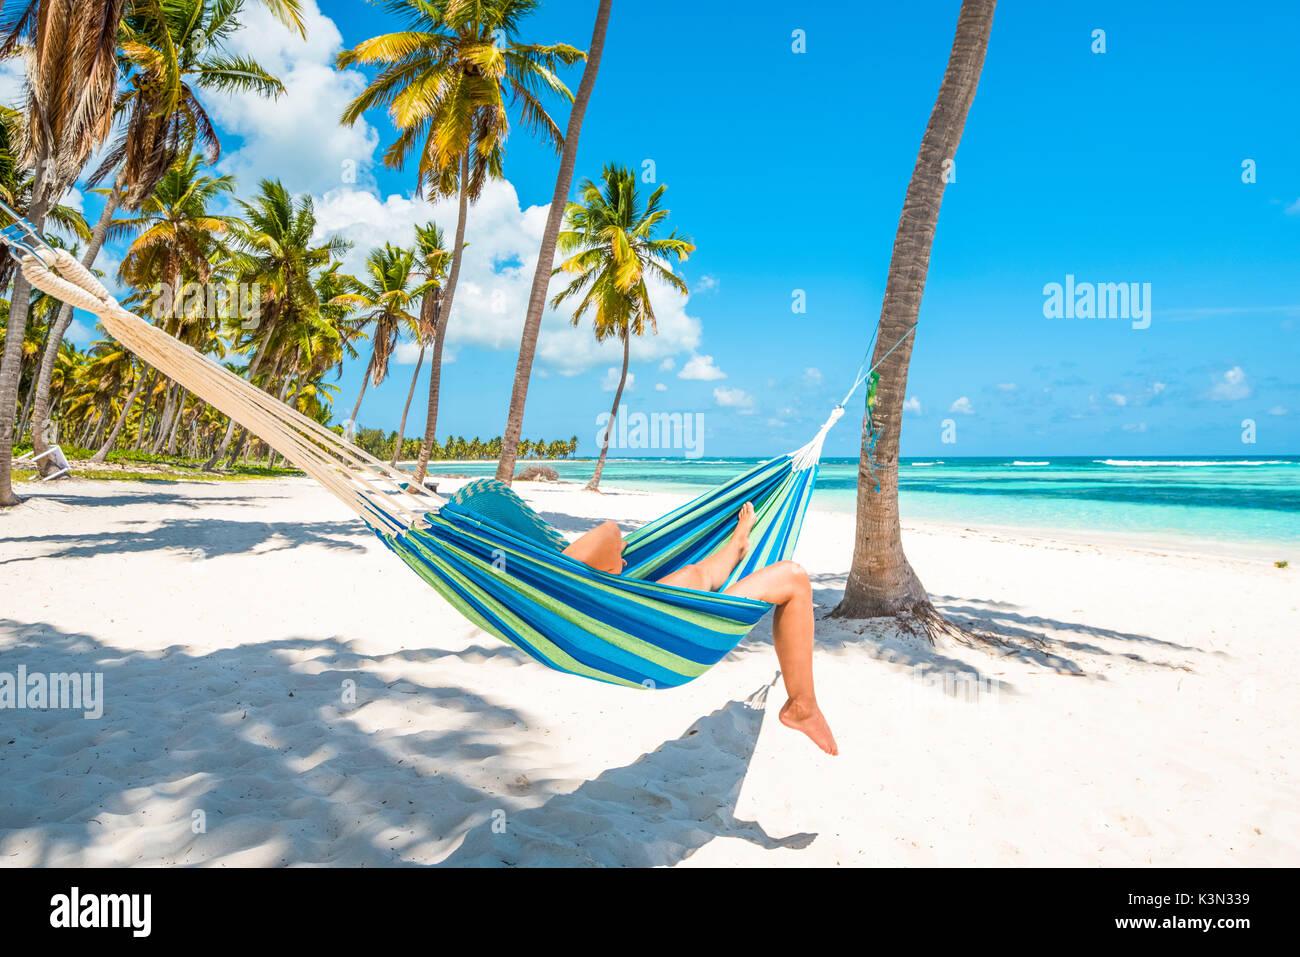 Canto de la Playa, Saona, East National Park (Parque Nacional del Este), Dominikanische Republik, Karibik. Frau entspannen auf einer Hängematte am Strand (MR). Stockbild